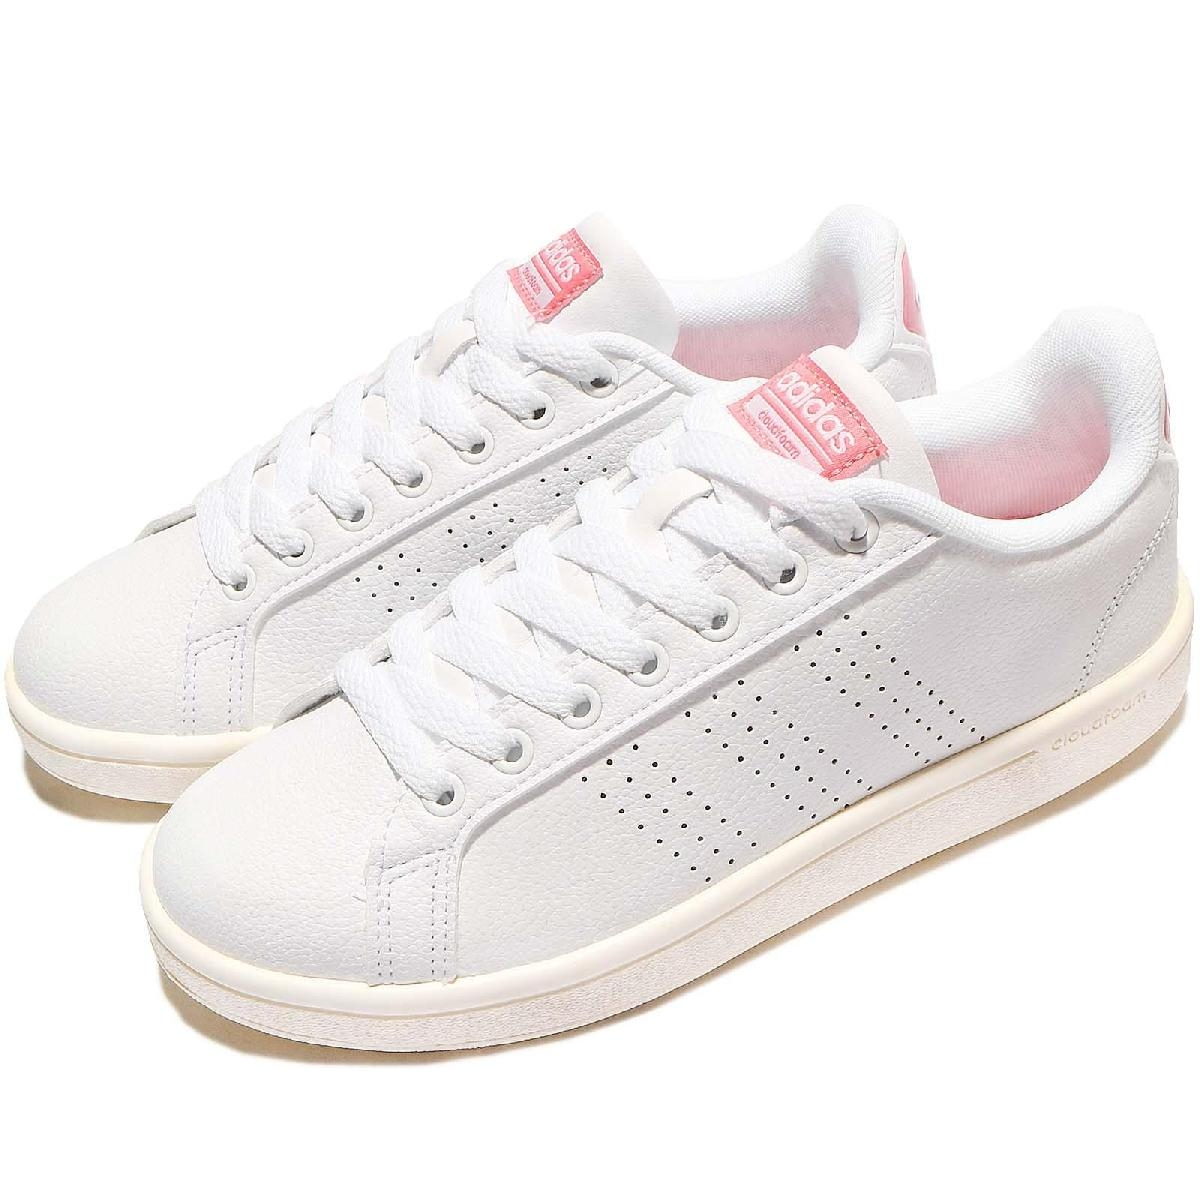 adidas 休閒鞋 Cloudfoam Advantage Clean 白 粉紅 皮革 奶油底 小白鞋 女鞋 【PUMP306】 AW3974